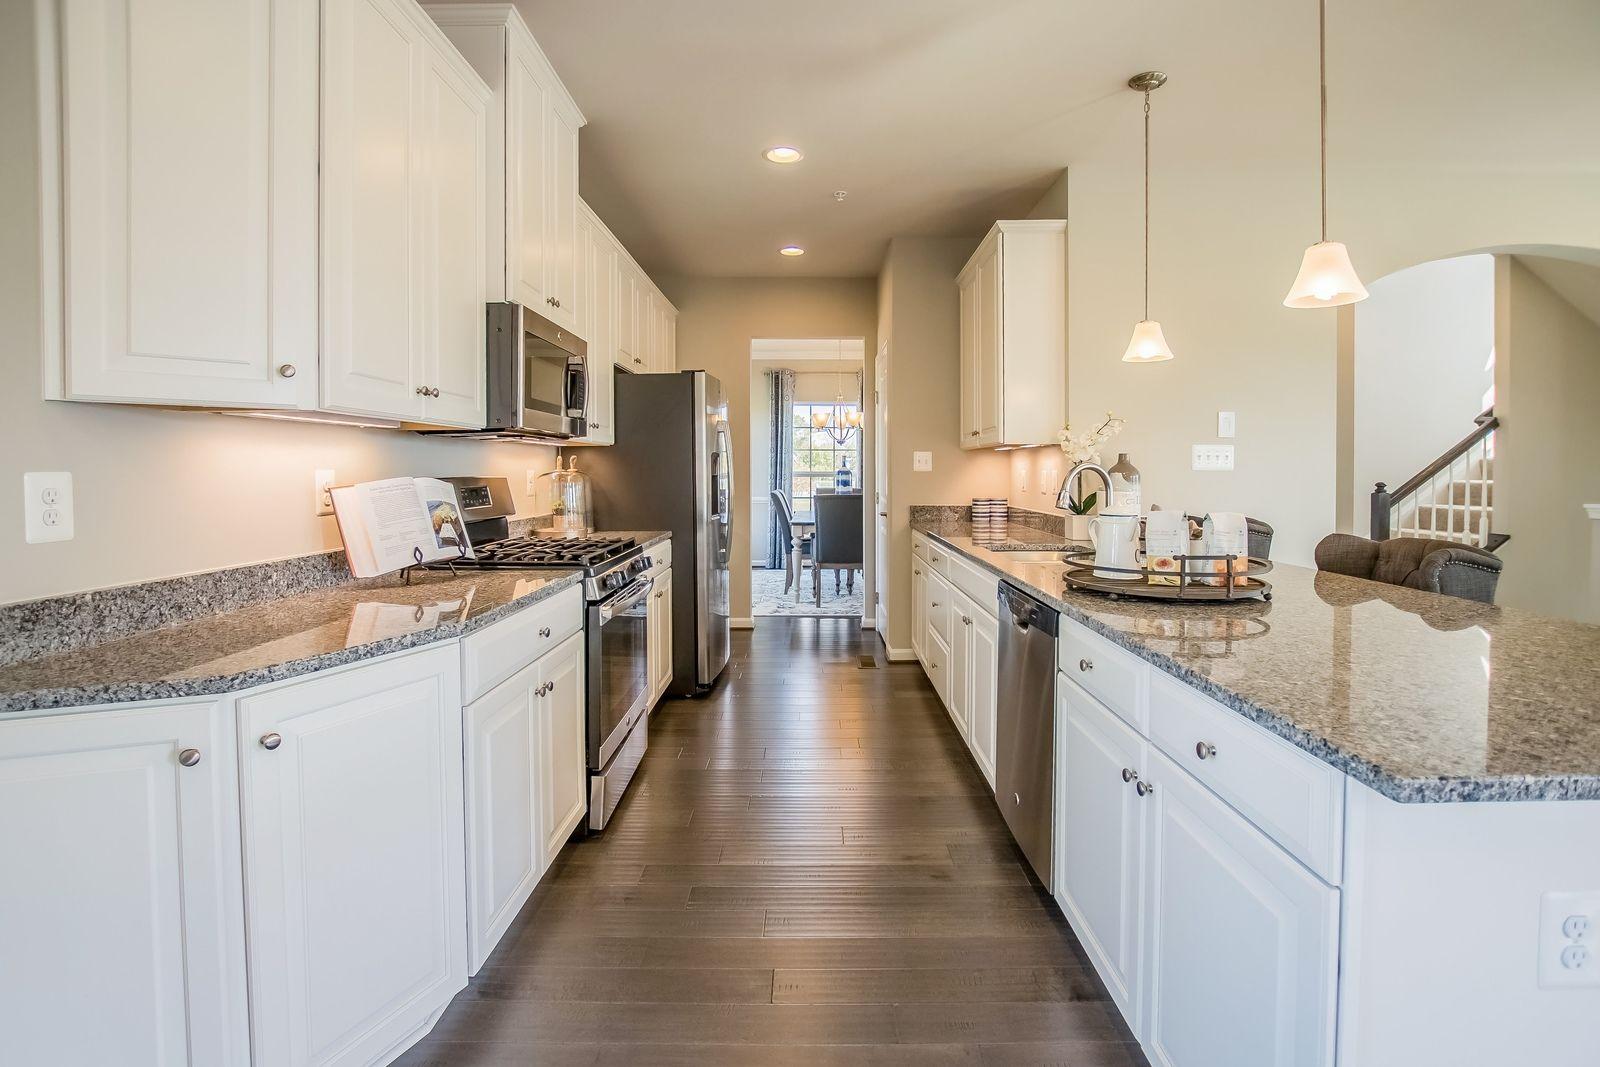 Kitchen featured in the Ernest Hemingway By Ryan Homes in Norfolk-Newport News, VA